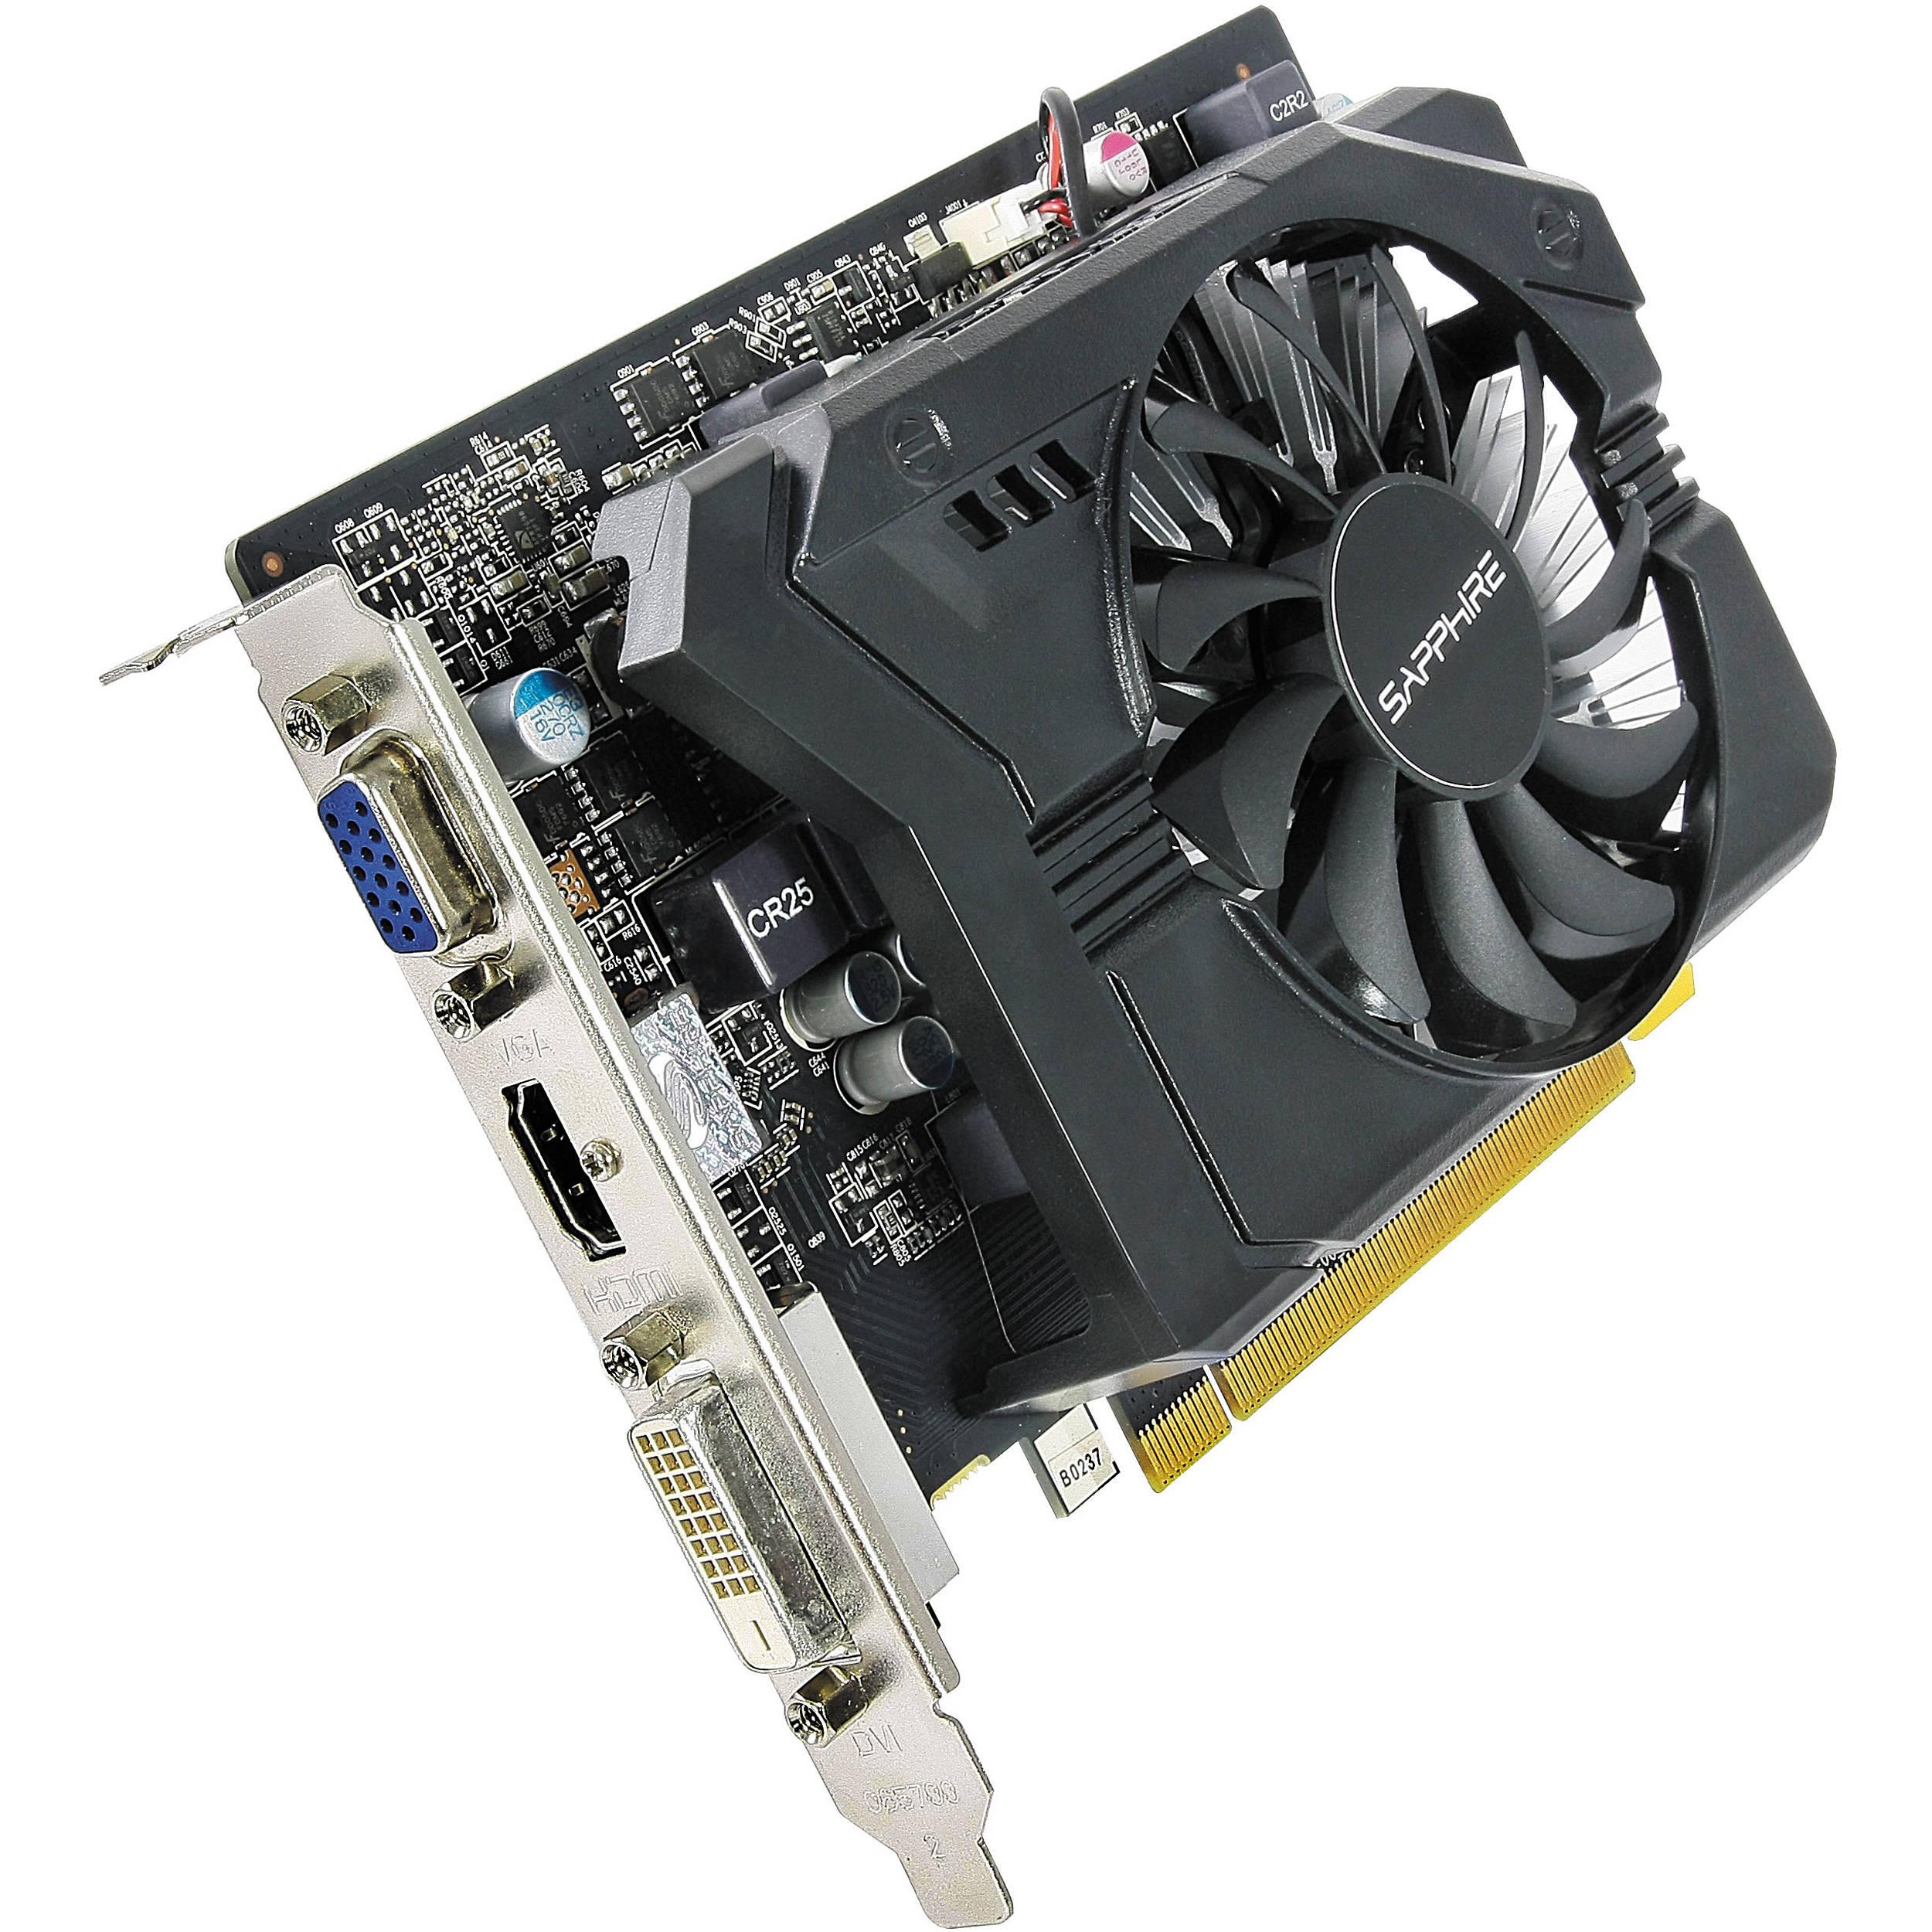 Sapphire Radeon R7 250 Graphics Card (1GB GDDR5, Boost)